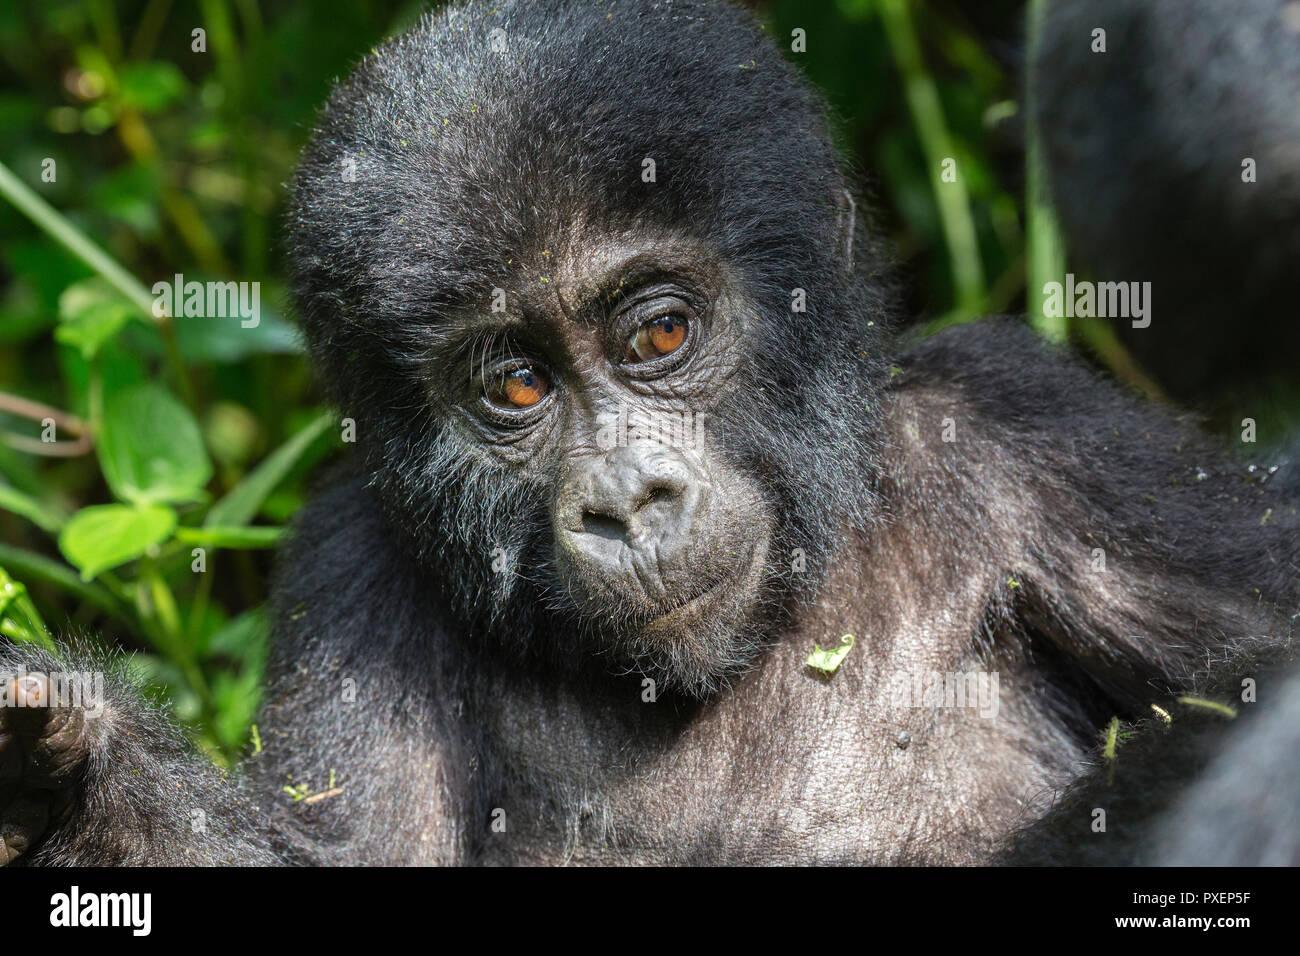 Mountain gorillas in the Bwindi Impenetrable Forest, Uganda - Stock Image